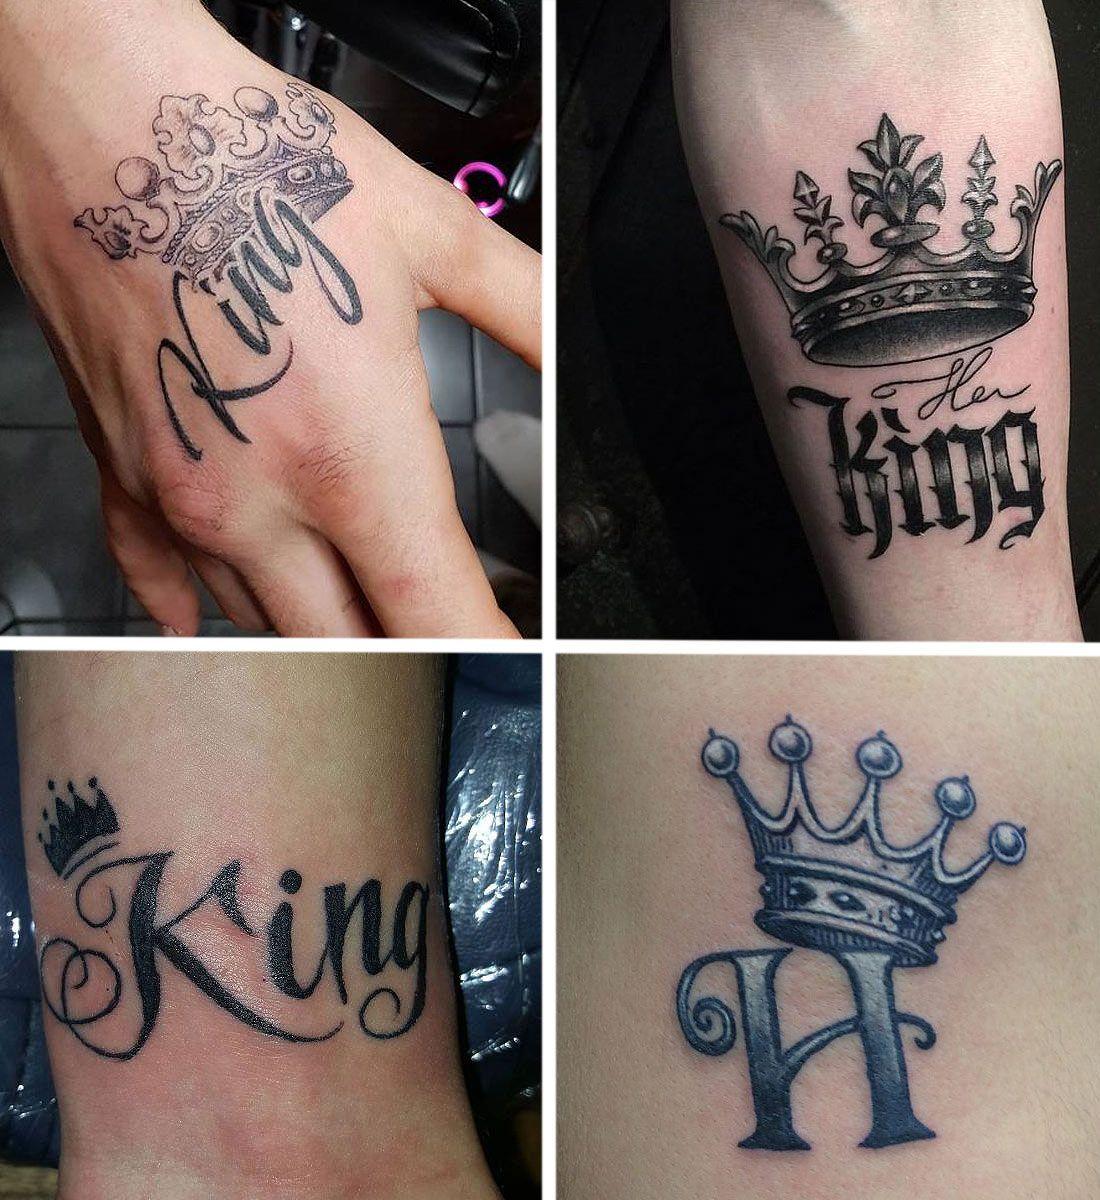 New Tattoo 2019 Hand Tattoos For Guys Tattoo Styles Queen Tattoo